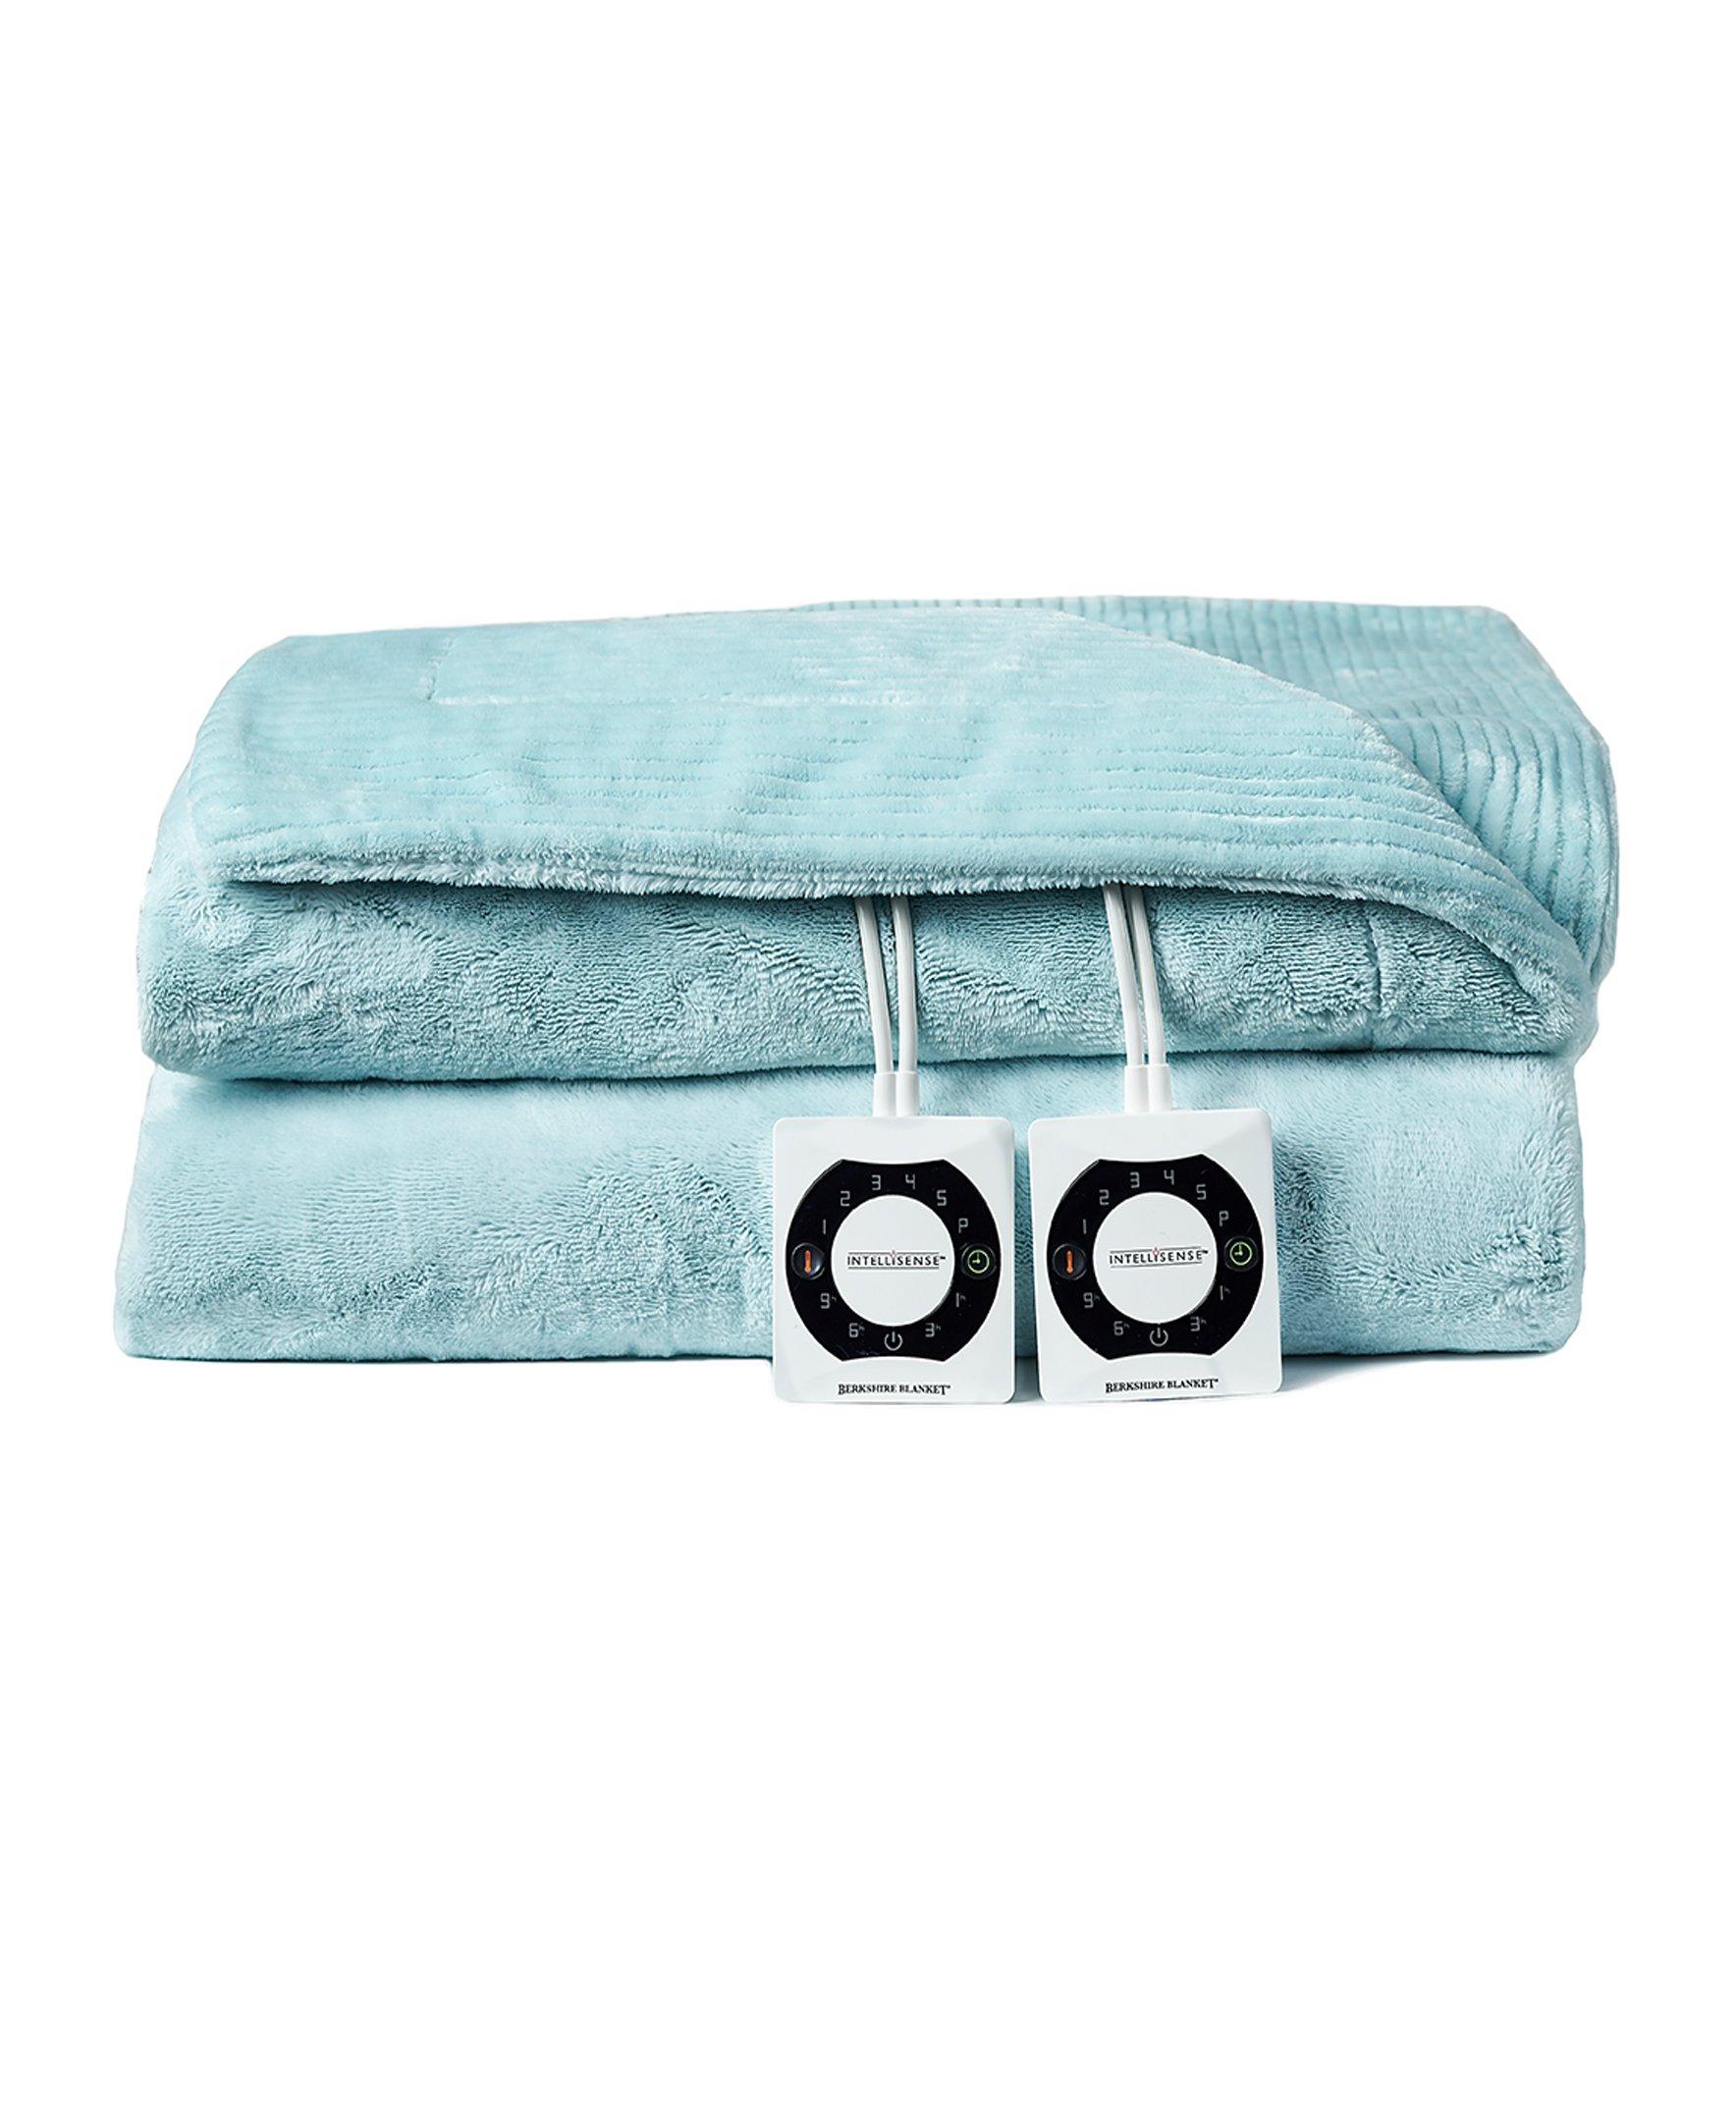 Berkshire Electric Blanket with Intellisense - Spa Blue - King Size Plush Heated Blanket